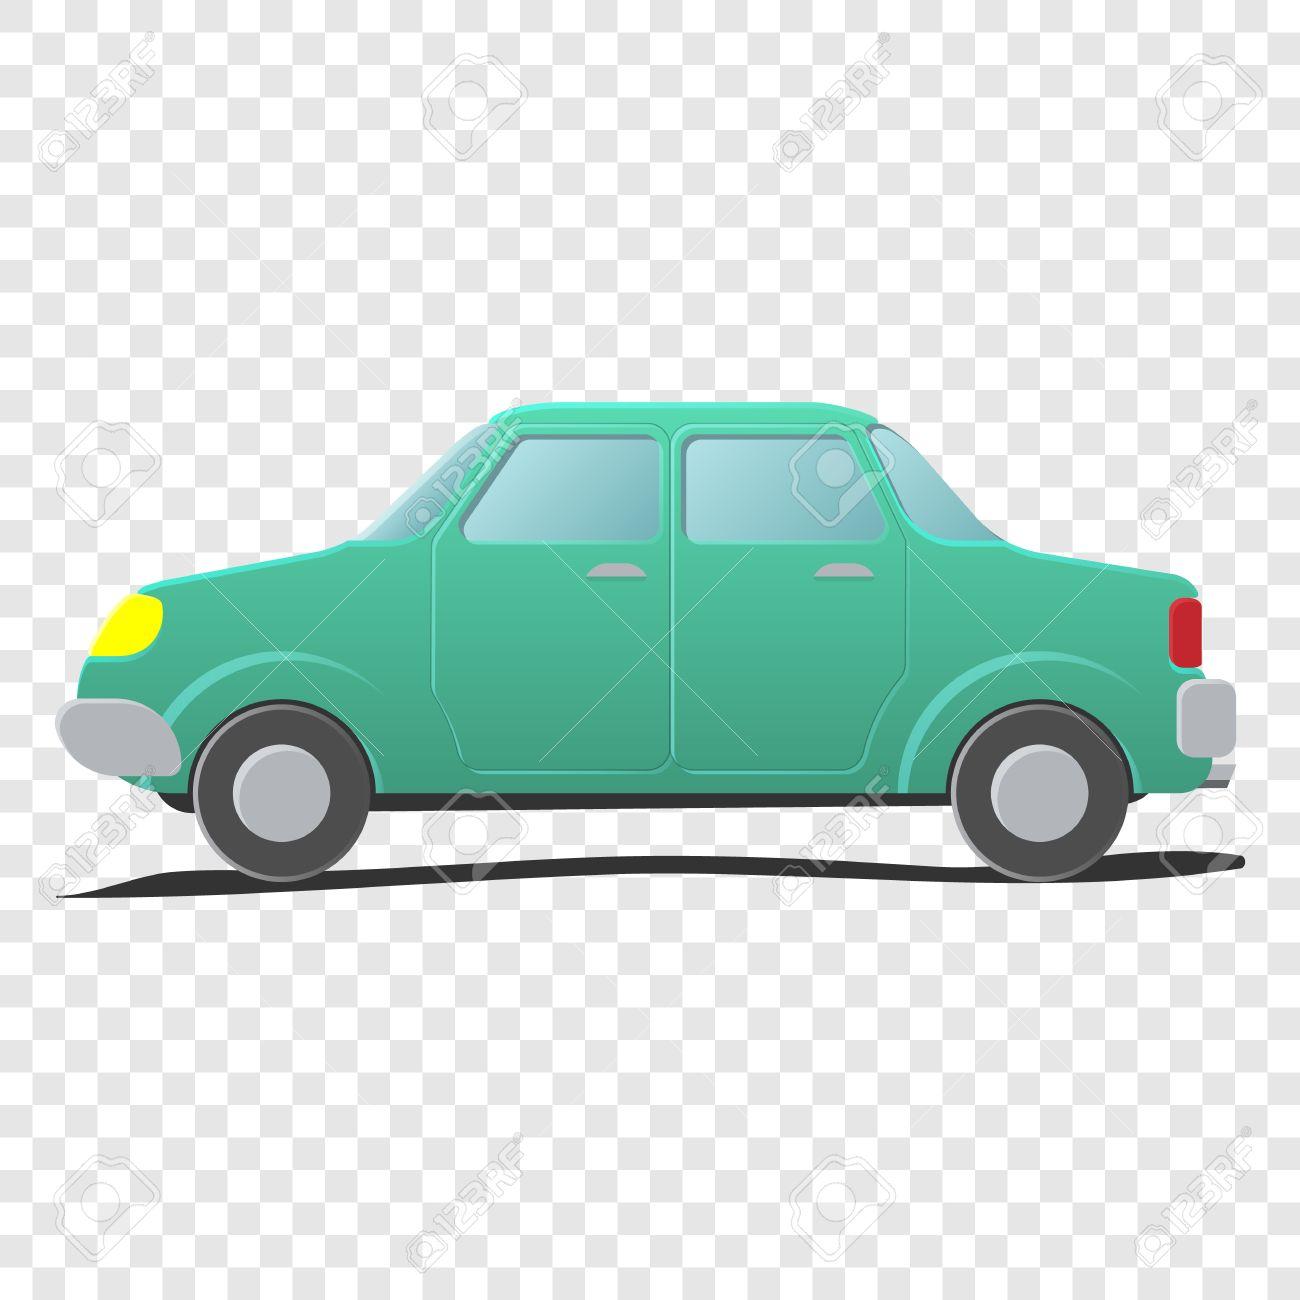 Sedan. Cartoon car illustration on transparent background.